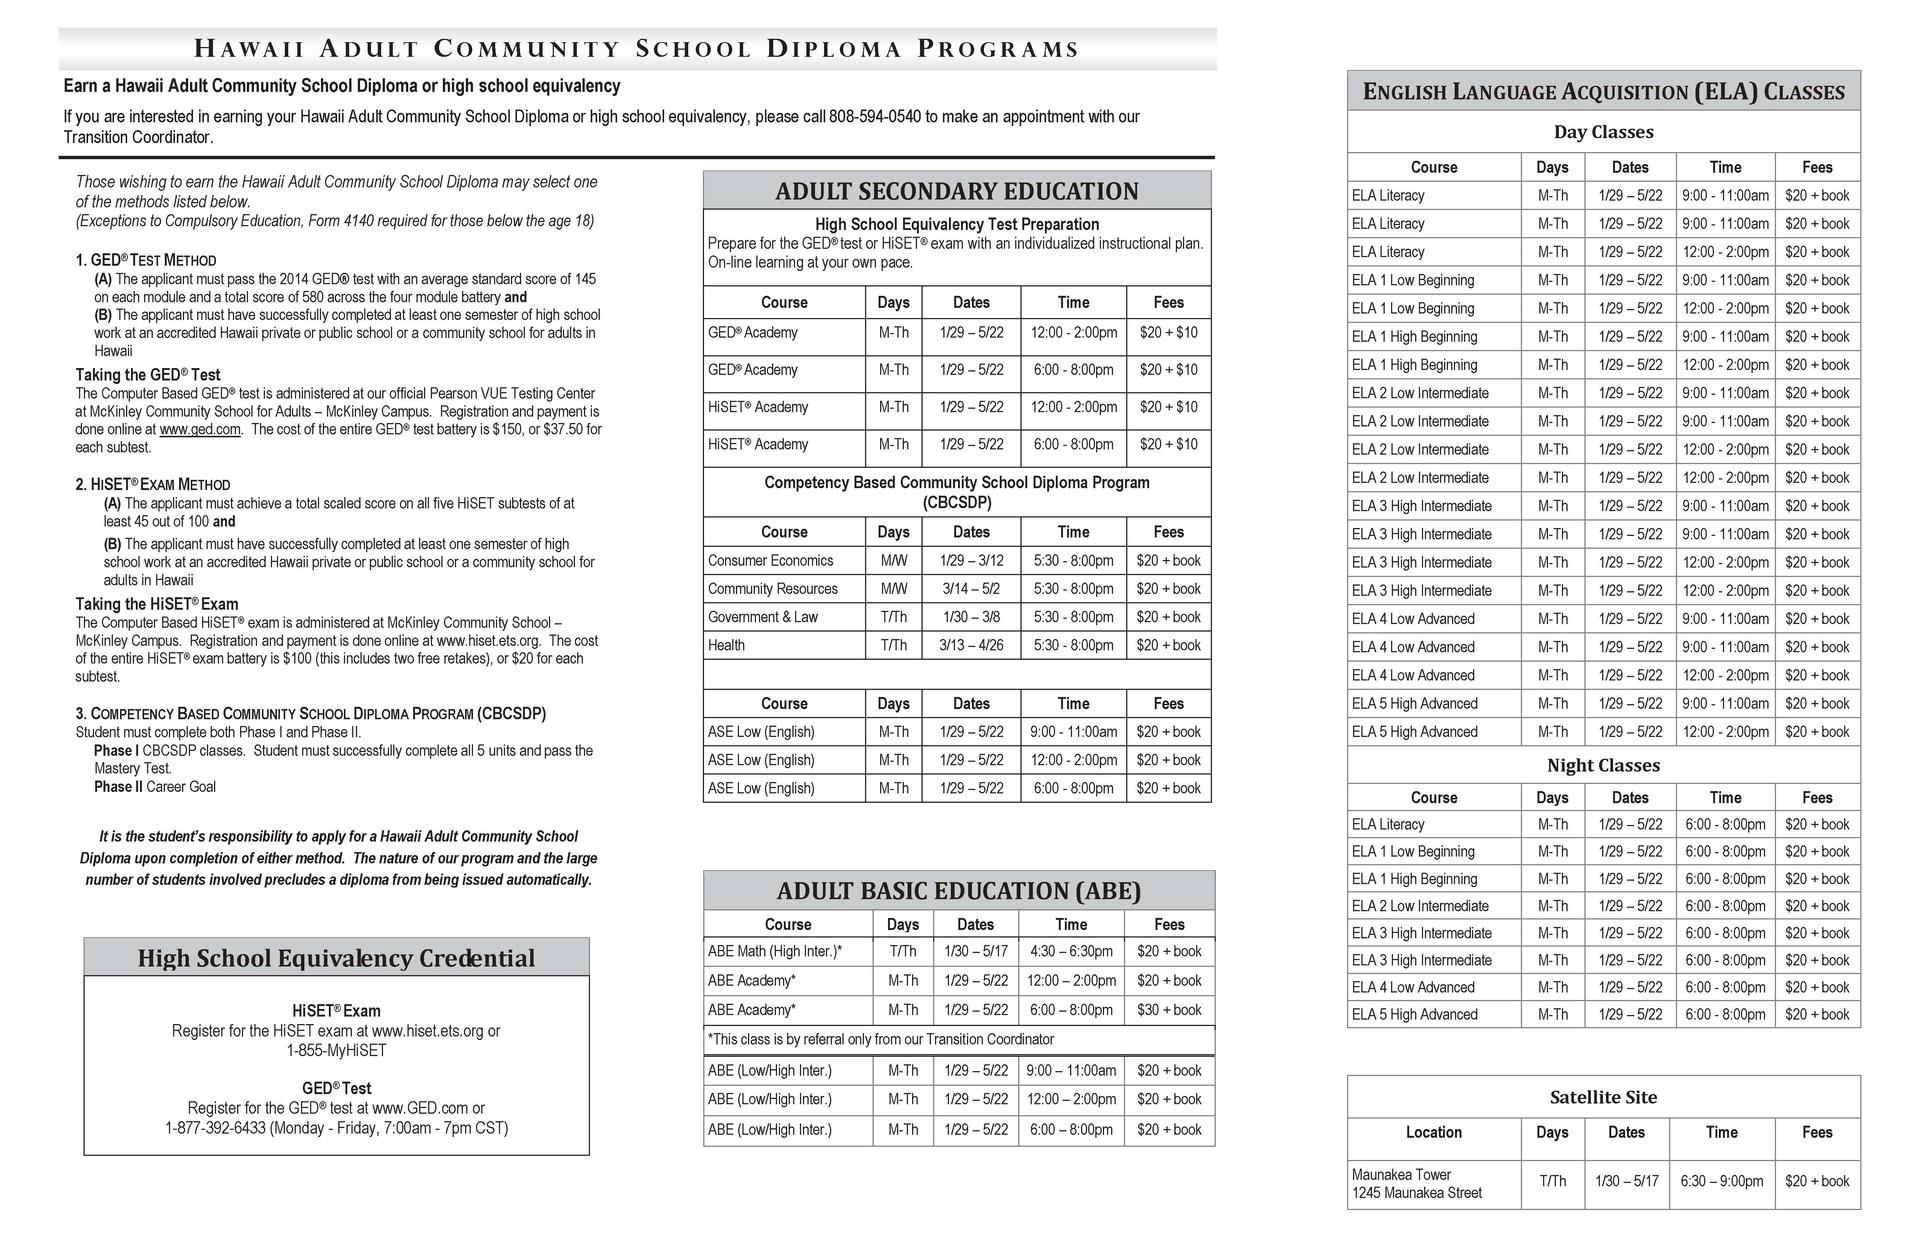 schedule of classes mckinley mckinley community school for adults pauseenlarge